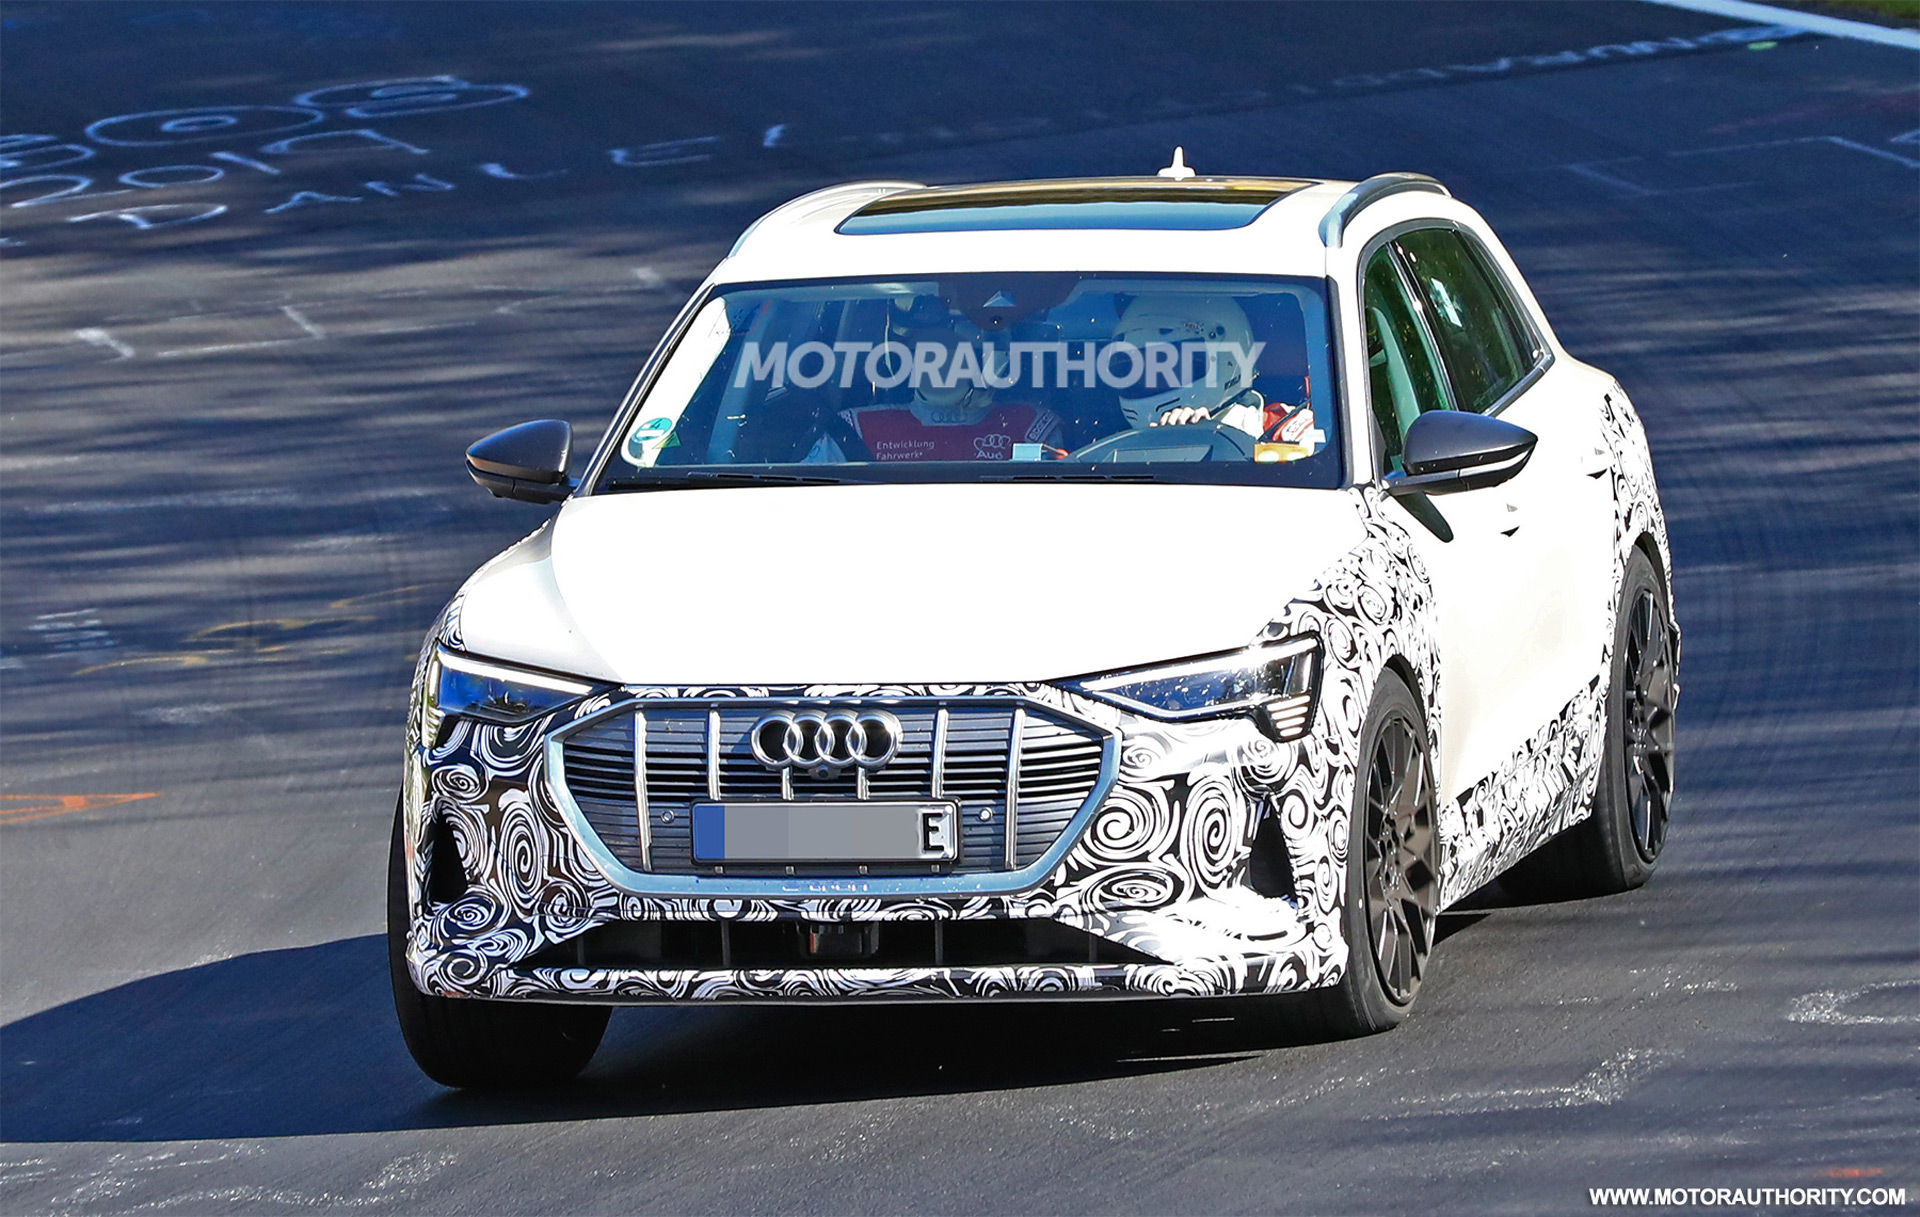 2018 [Audi] E-Tron Quattro - Page 7 2020-audi-e-tron-s-spy-shots--image-via-s-baldauf-sb-medien_100702340_h